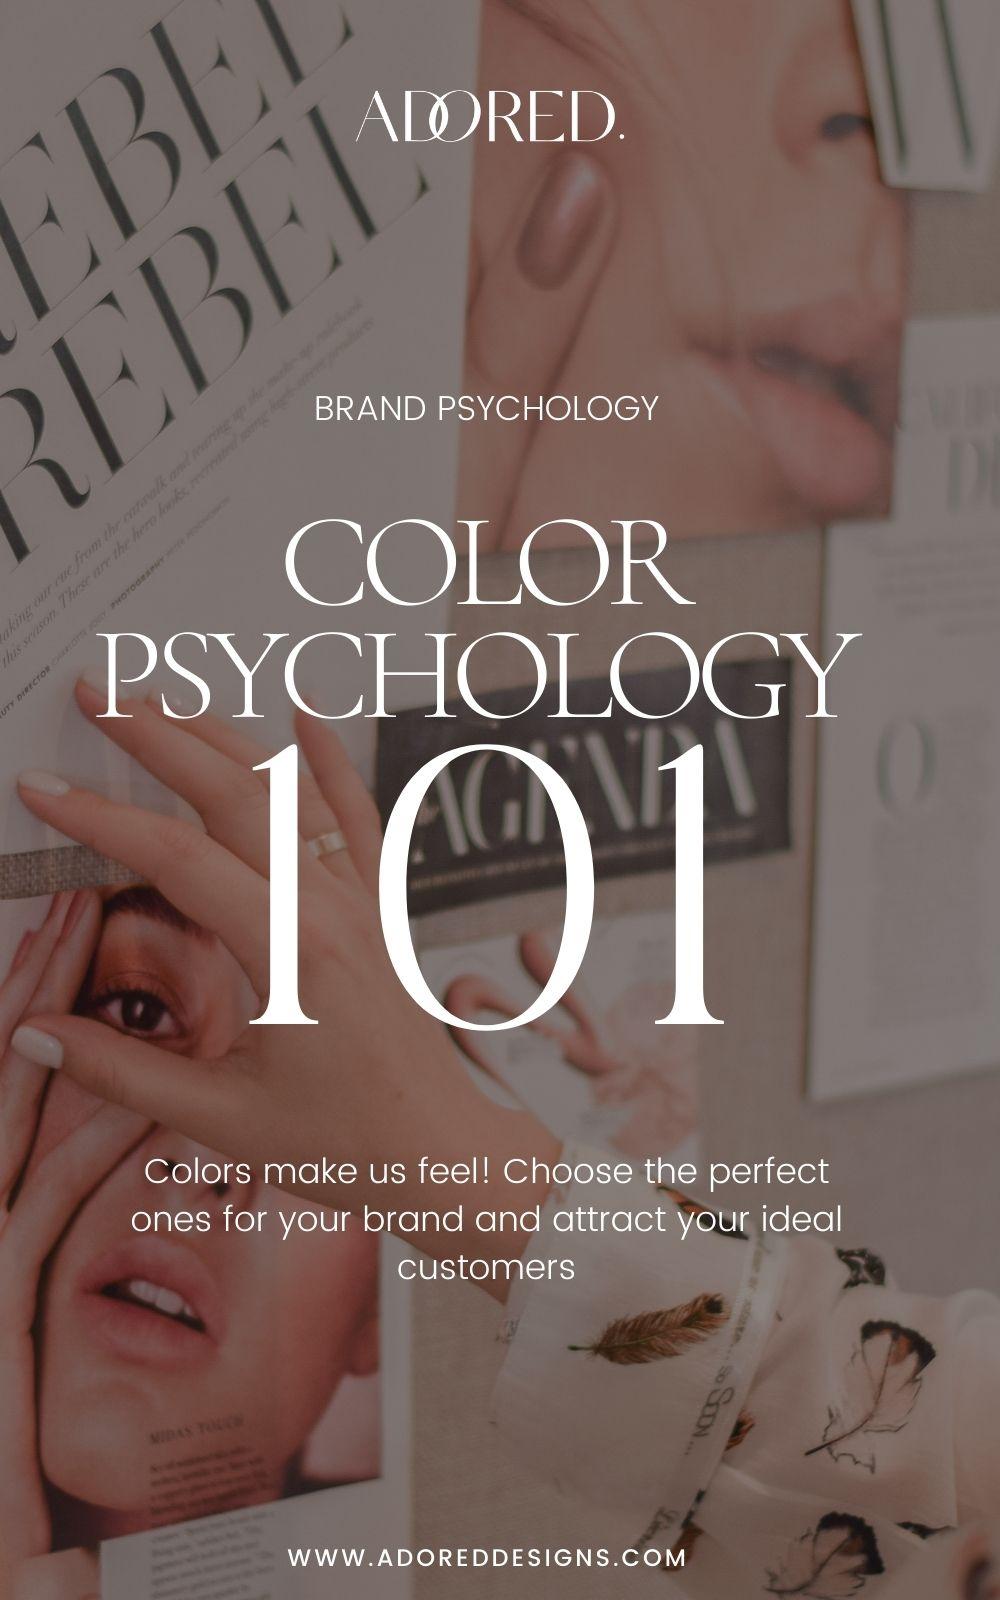 Color psychology 101